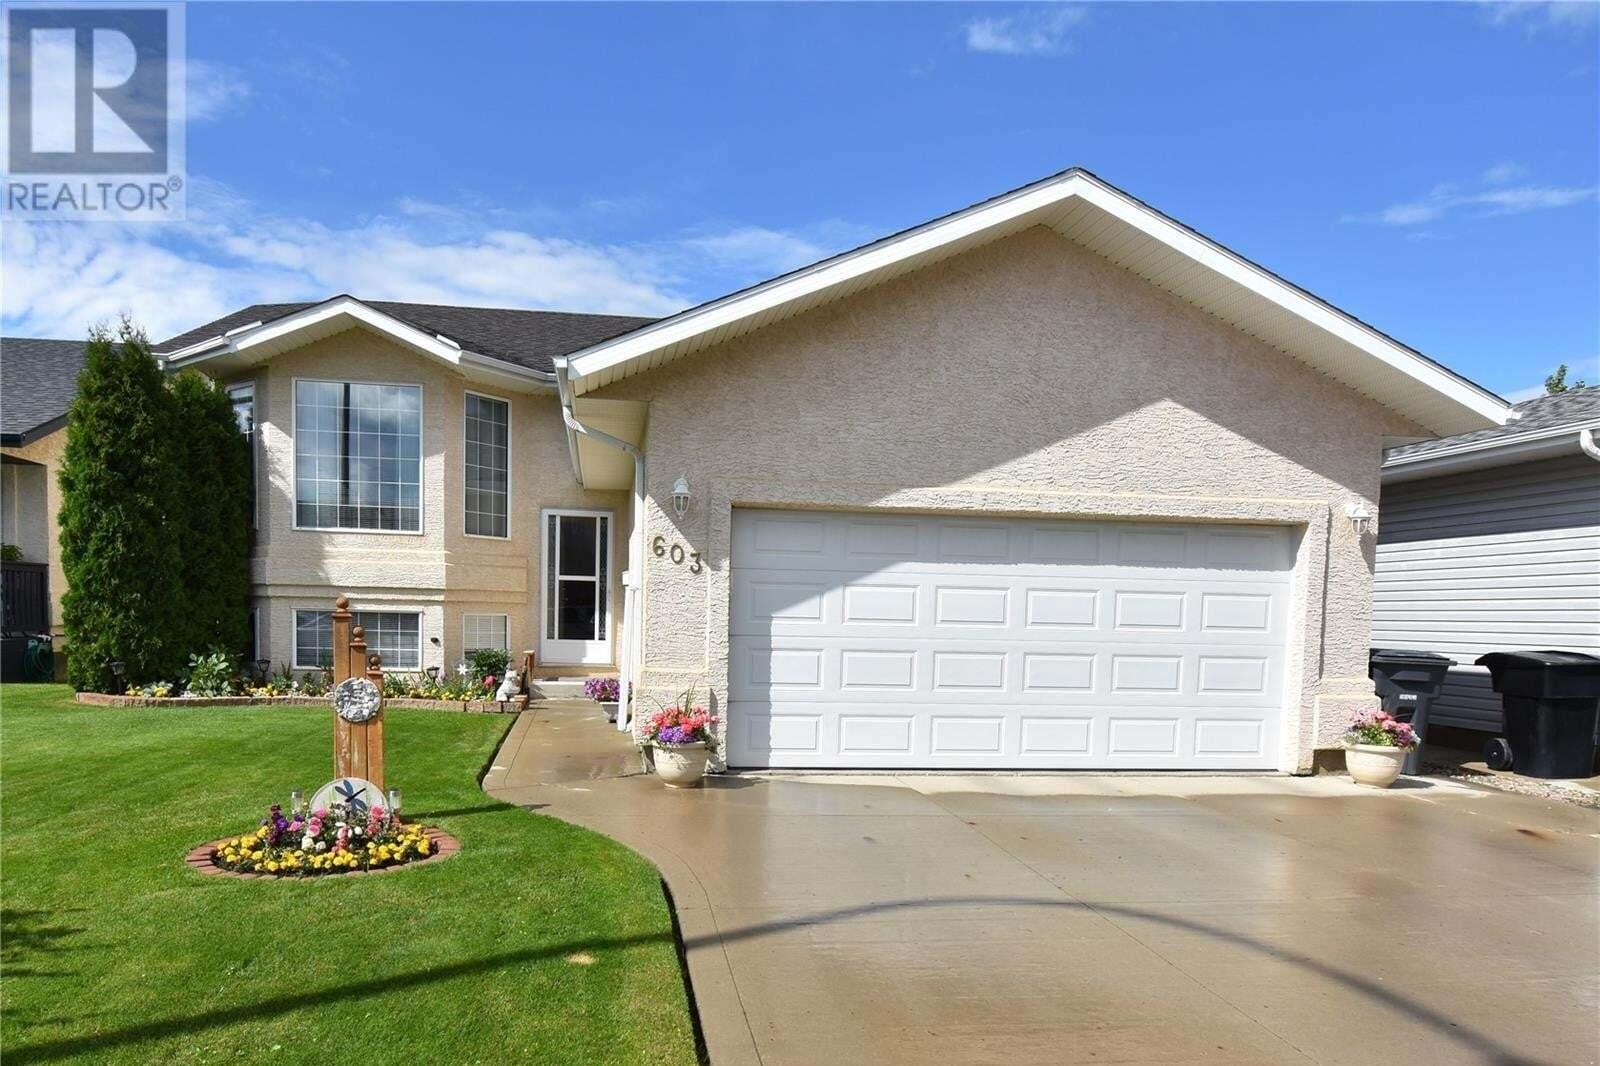 House for sale at 603 Giesbrecht Ct Martensville Saskatchewan - MLS: SK823321